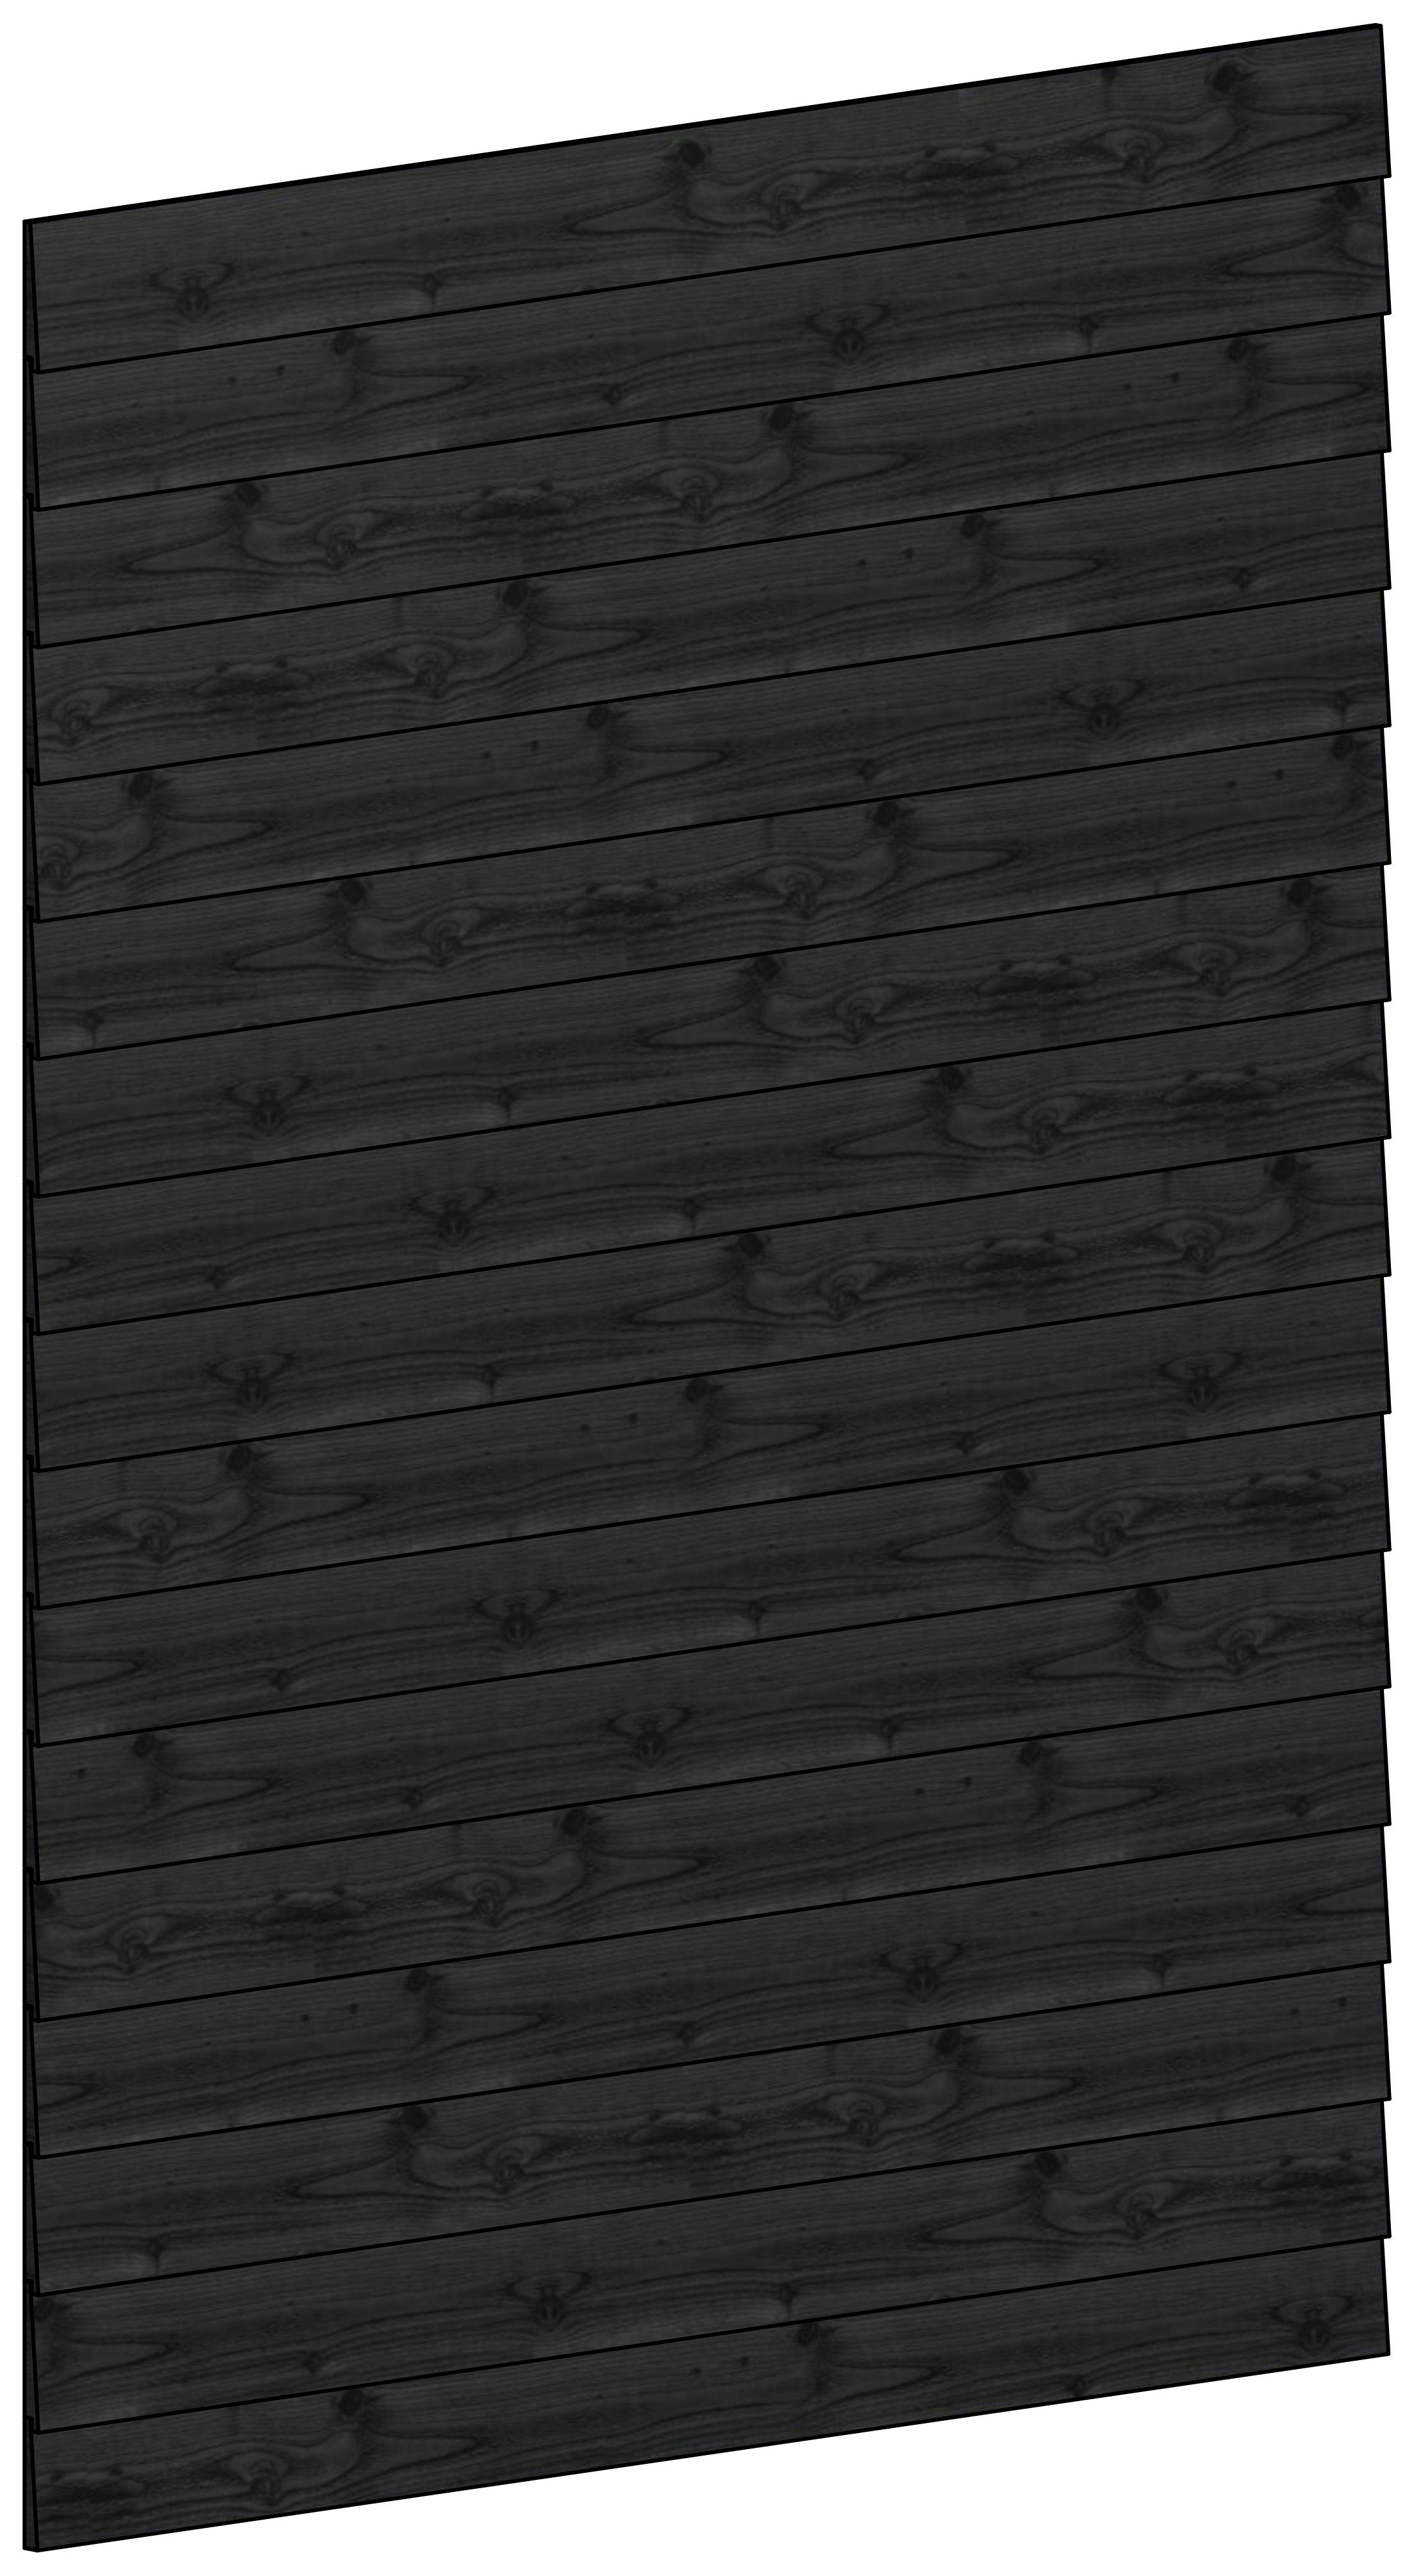 Trendhout | Wandmodule B potdekselplanken zwart | 163x220 cm